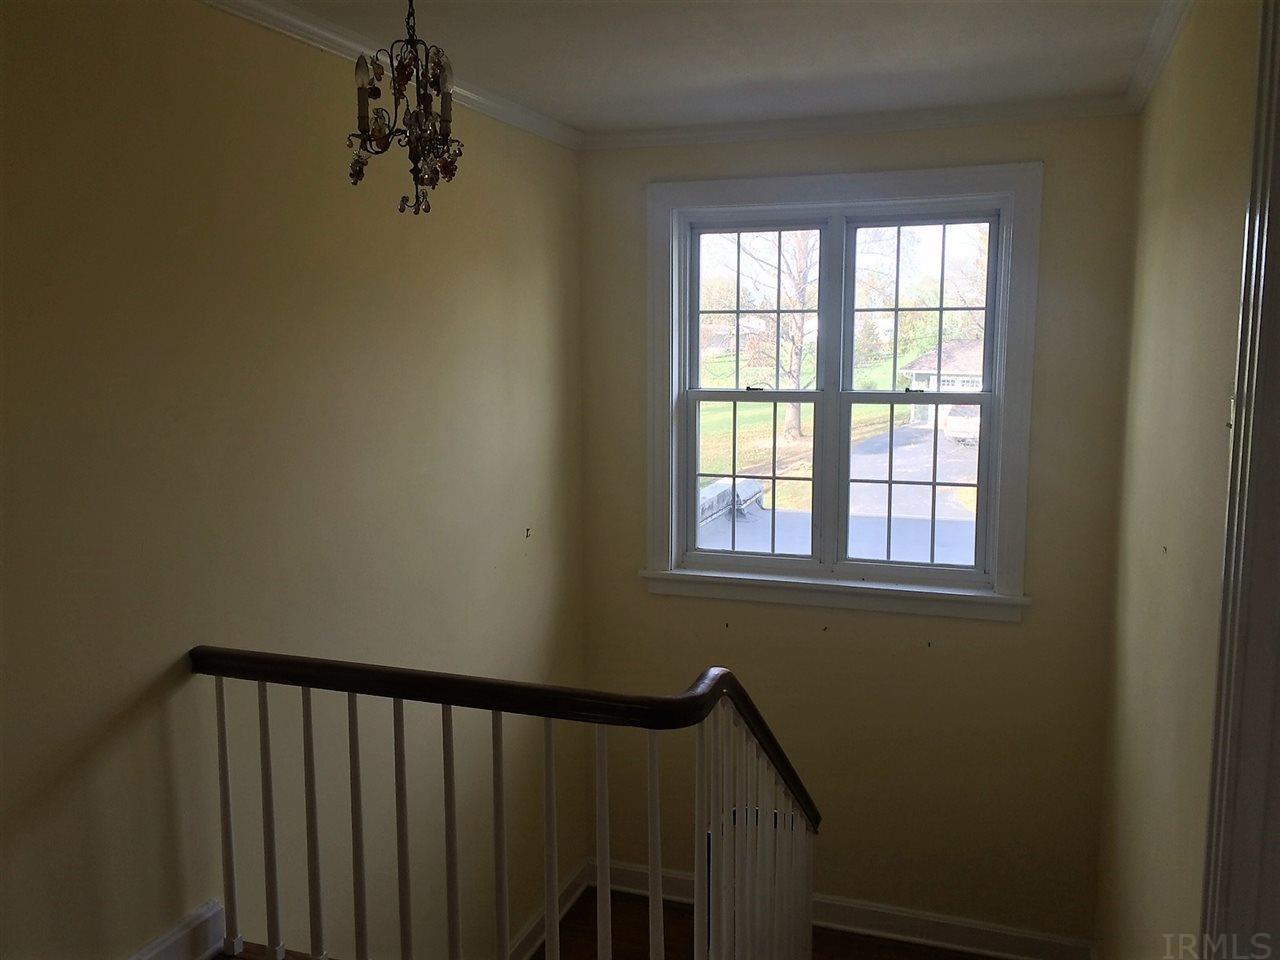 12 Hillcrest Circle, Bedford, IN, 47421 - SOLD LISTING | Carpenter ...